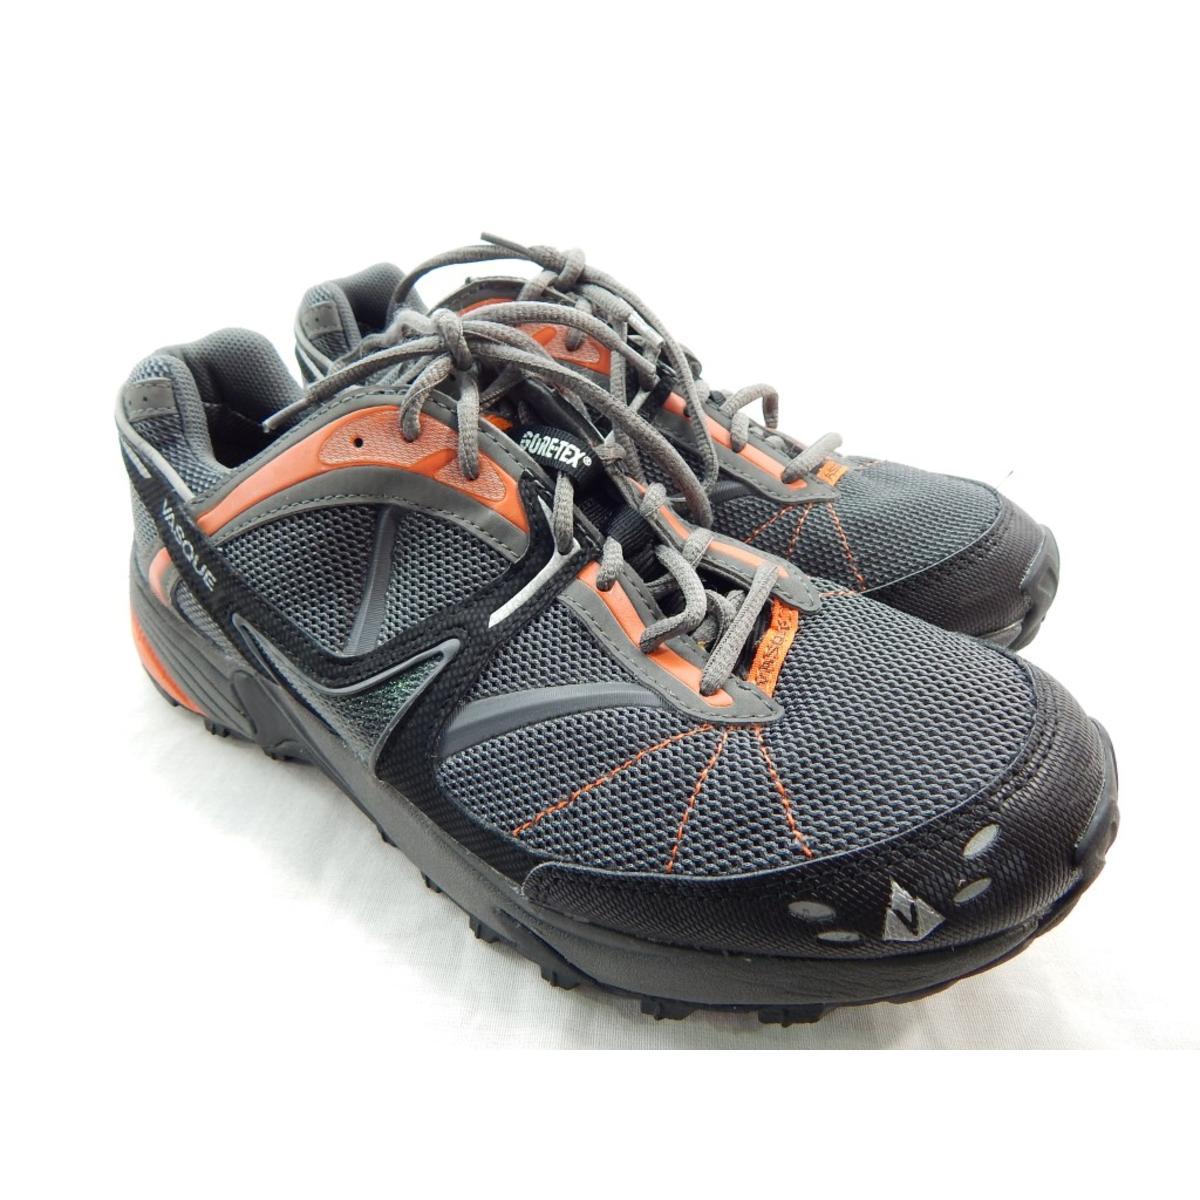 Vasque Mindbender Trail Running Shoes Men